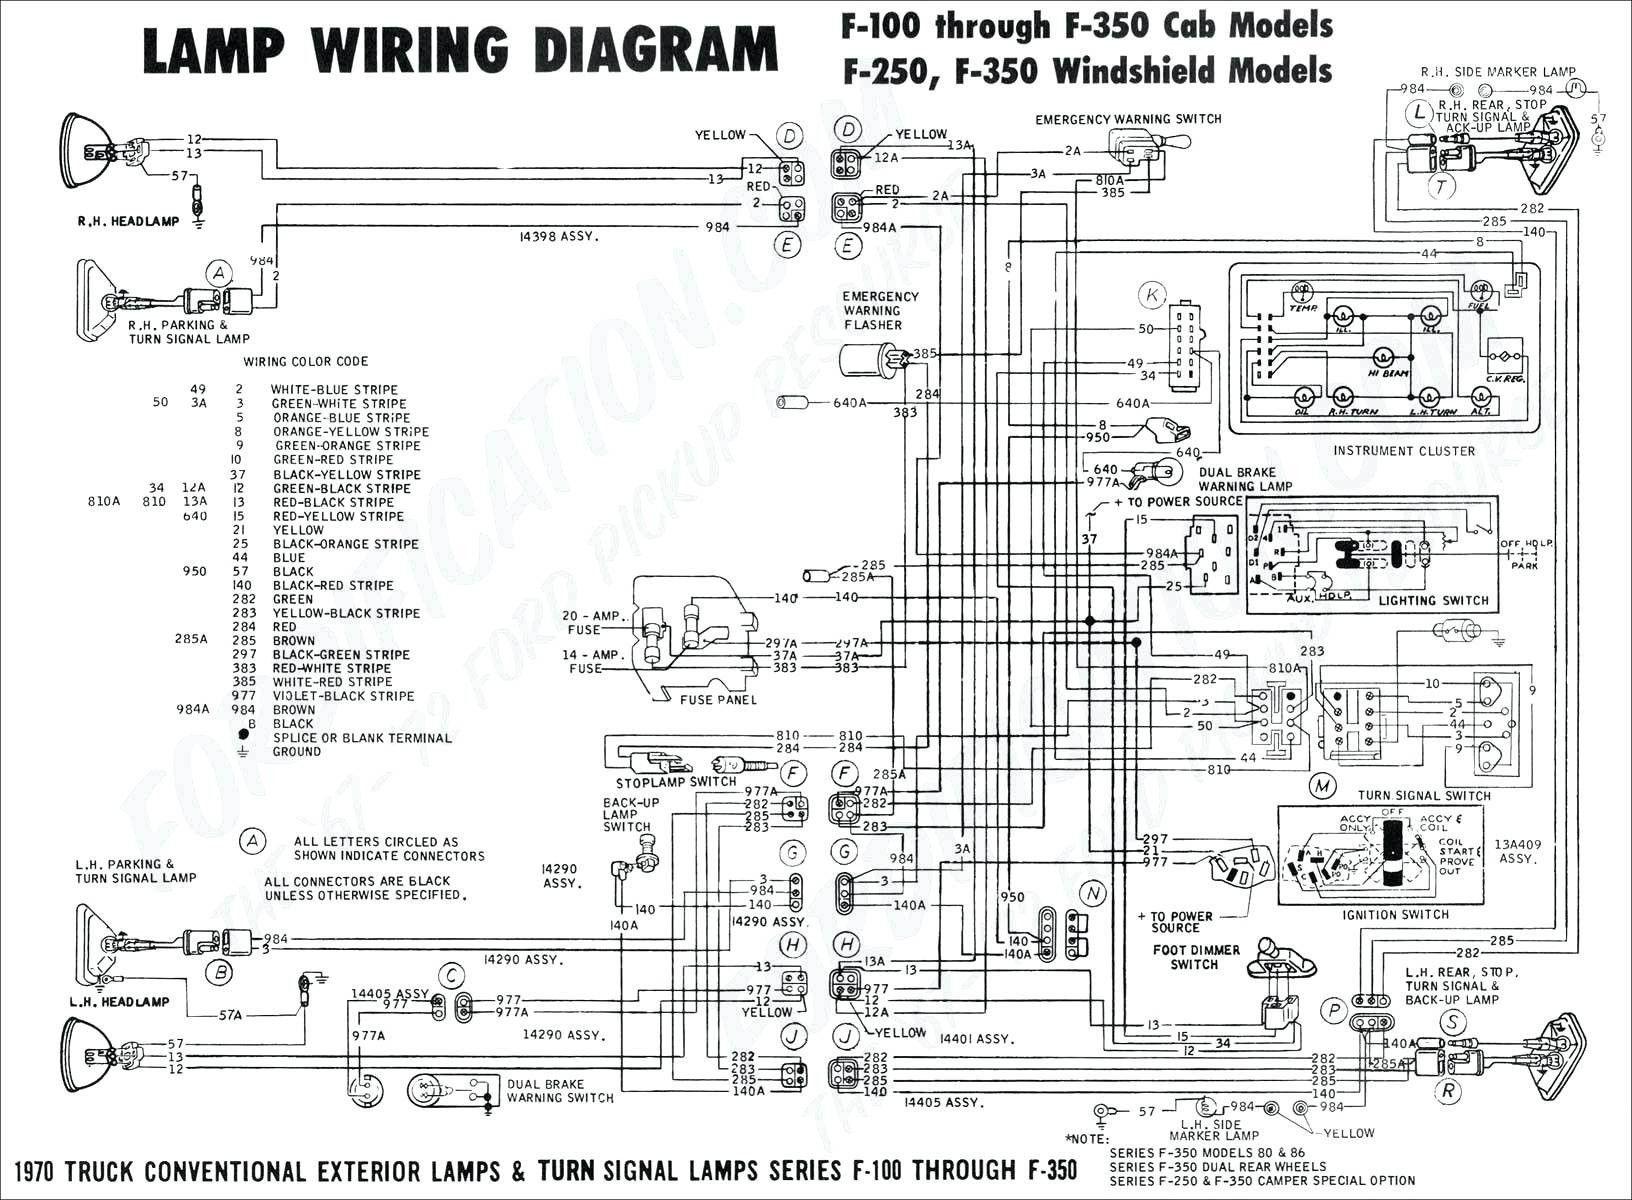 2003 Silverado Tail Light Wiring Diagram Trailer Wiring Diagram Electrical Wiring Diagram Circuit Diagram